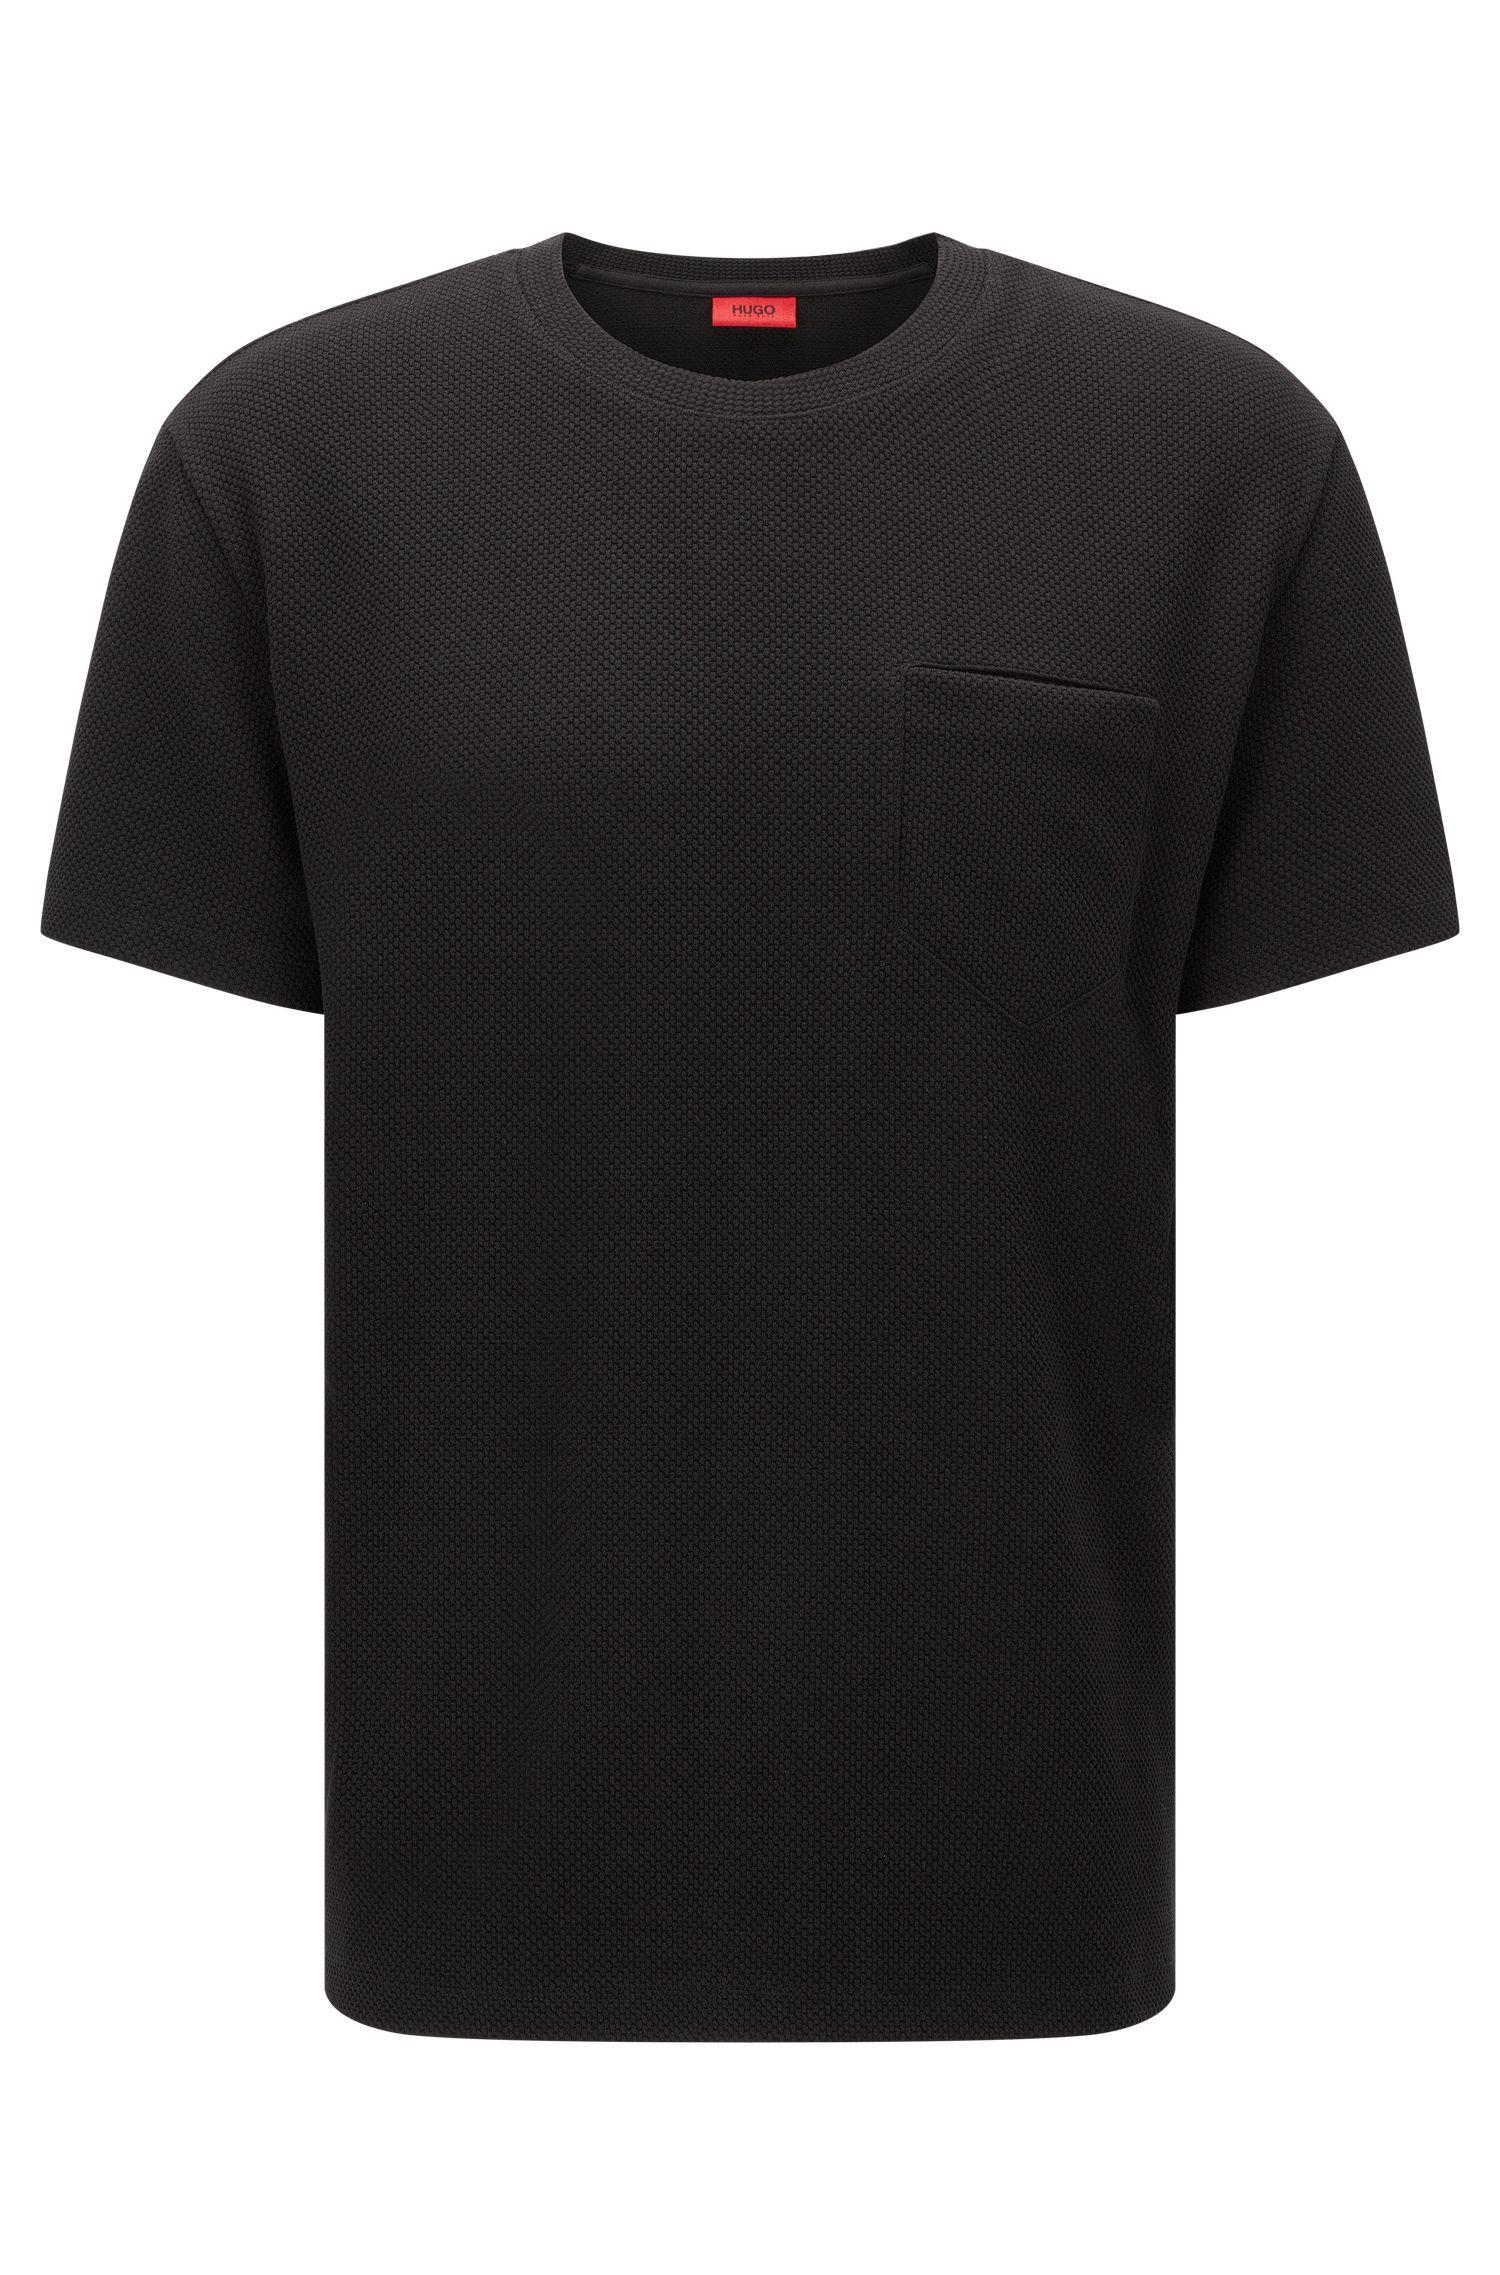 Oversize-Fit Kurzarm-Sweatshirt mit Brusttasche: 'Dandalay'